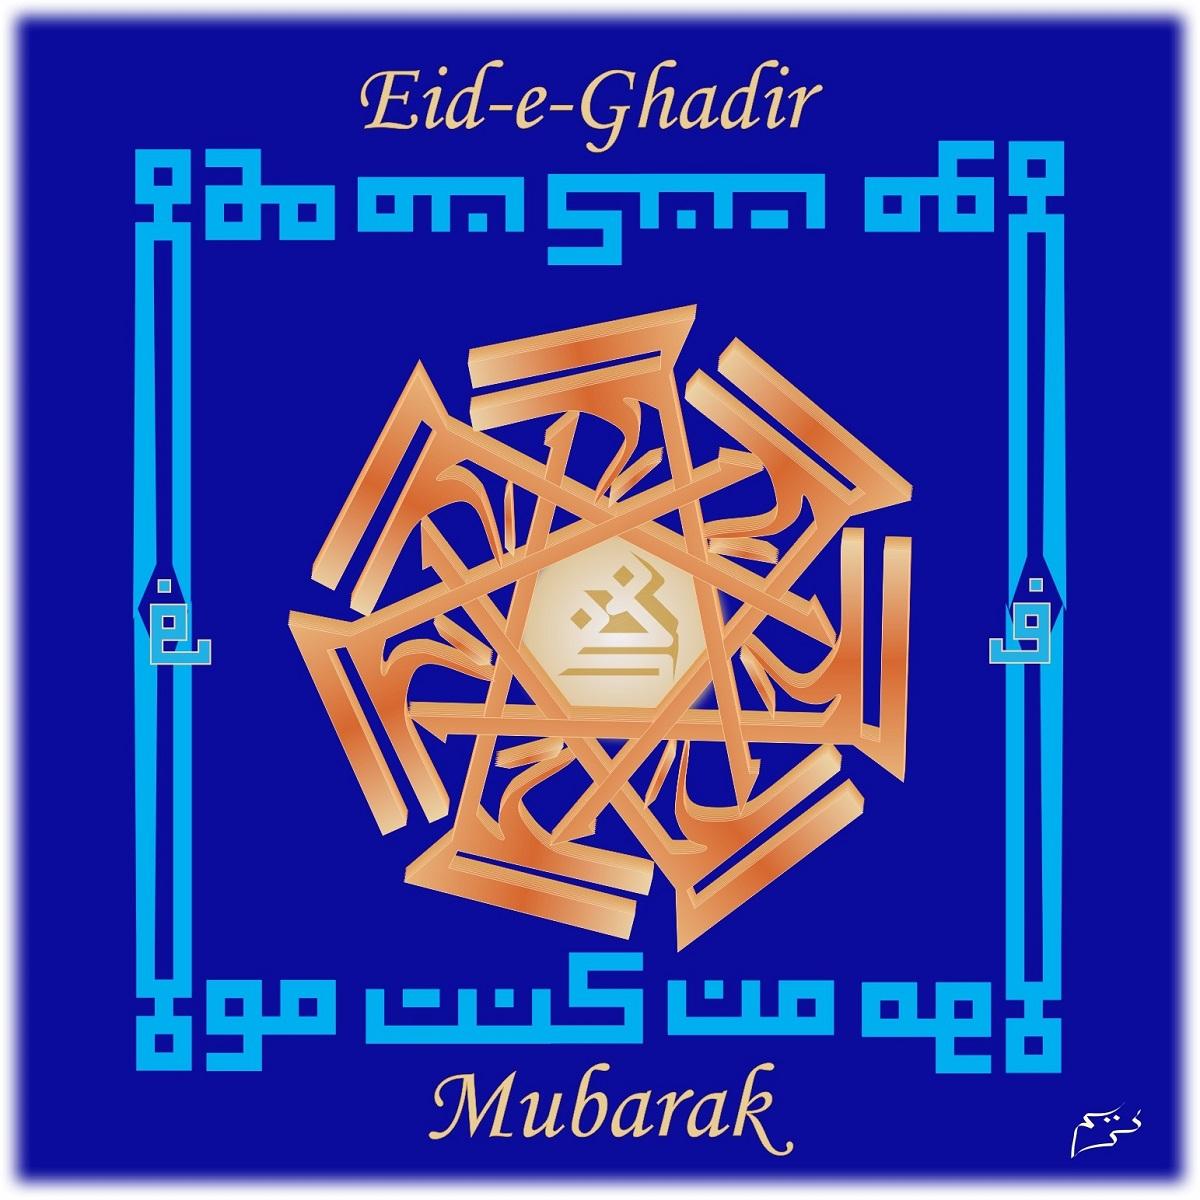 Eid-e Ghadir calligraphy by Karim Ismaili